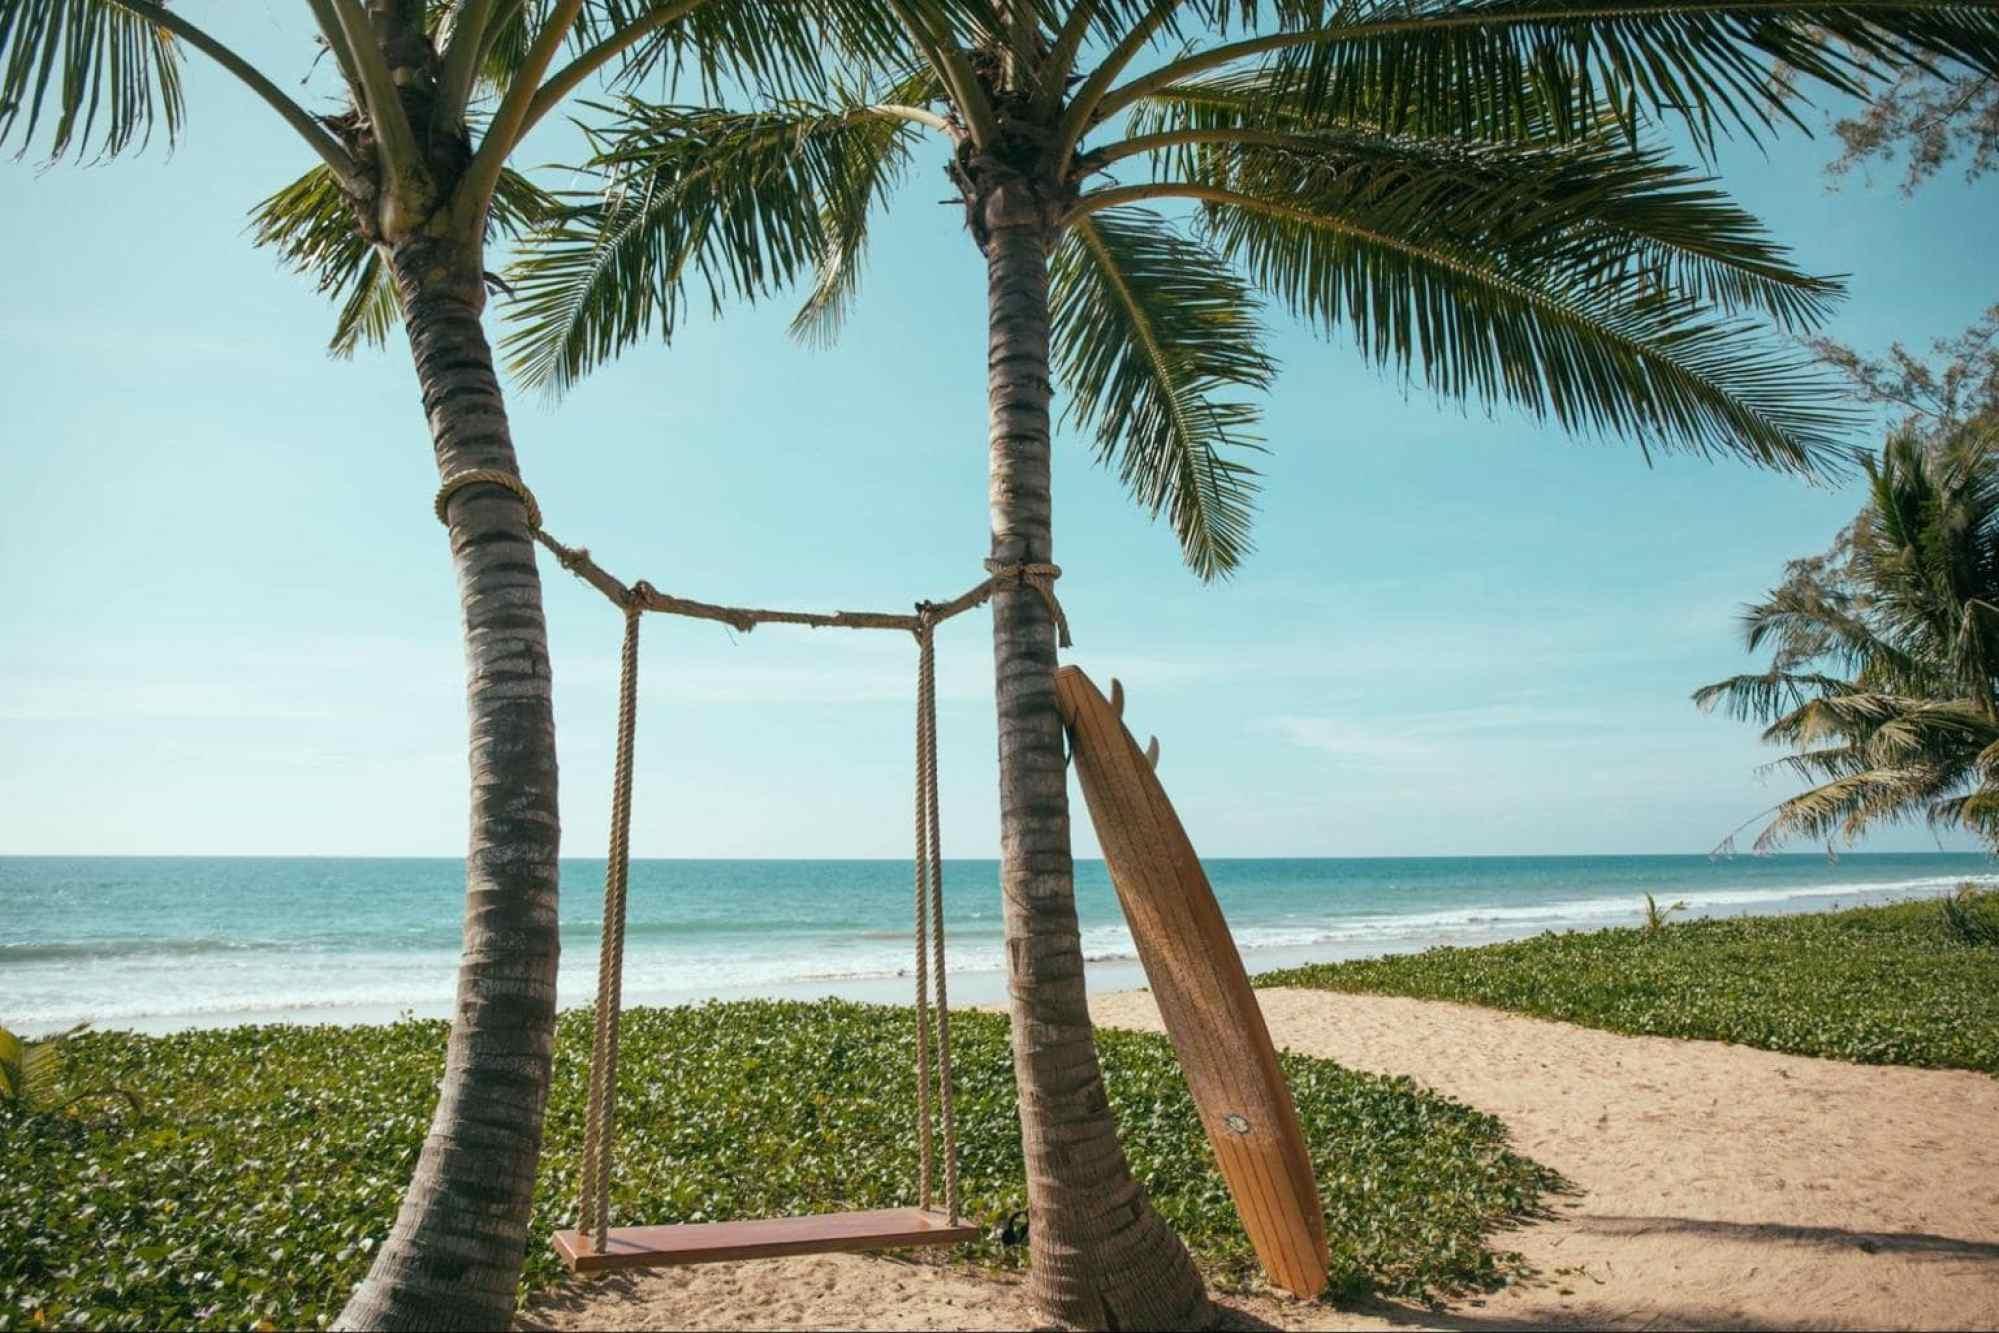 The beach swing at Baba Beach Club - Photo courtesy of Baba Beach Club Phuket